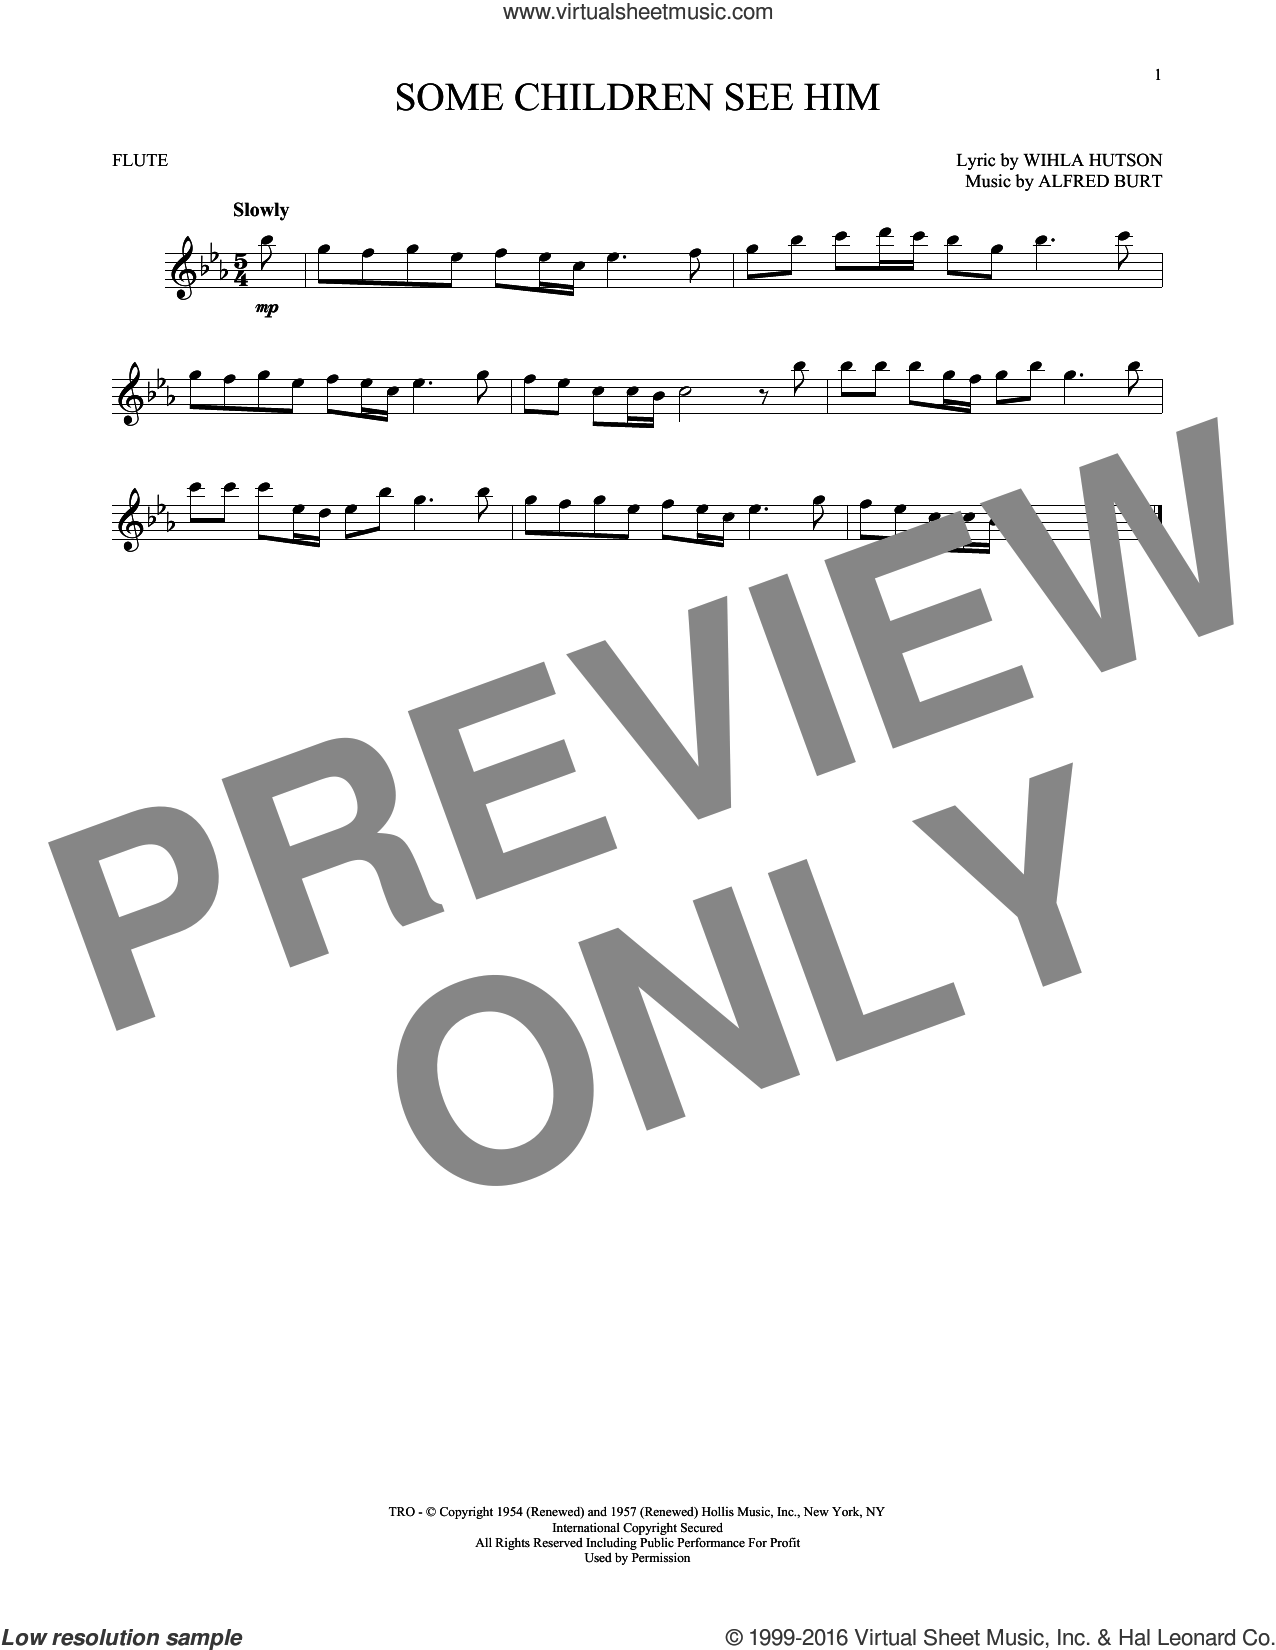 Some Children See Him sheet music for flute solo by Alfred Burt and Wihla Hutson, intermediate skill level